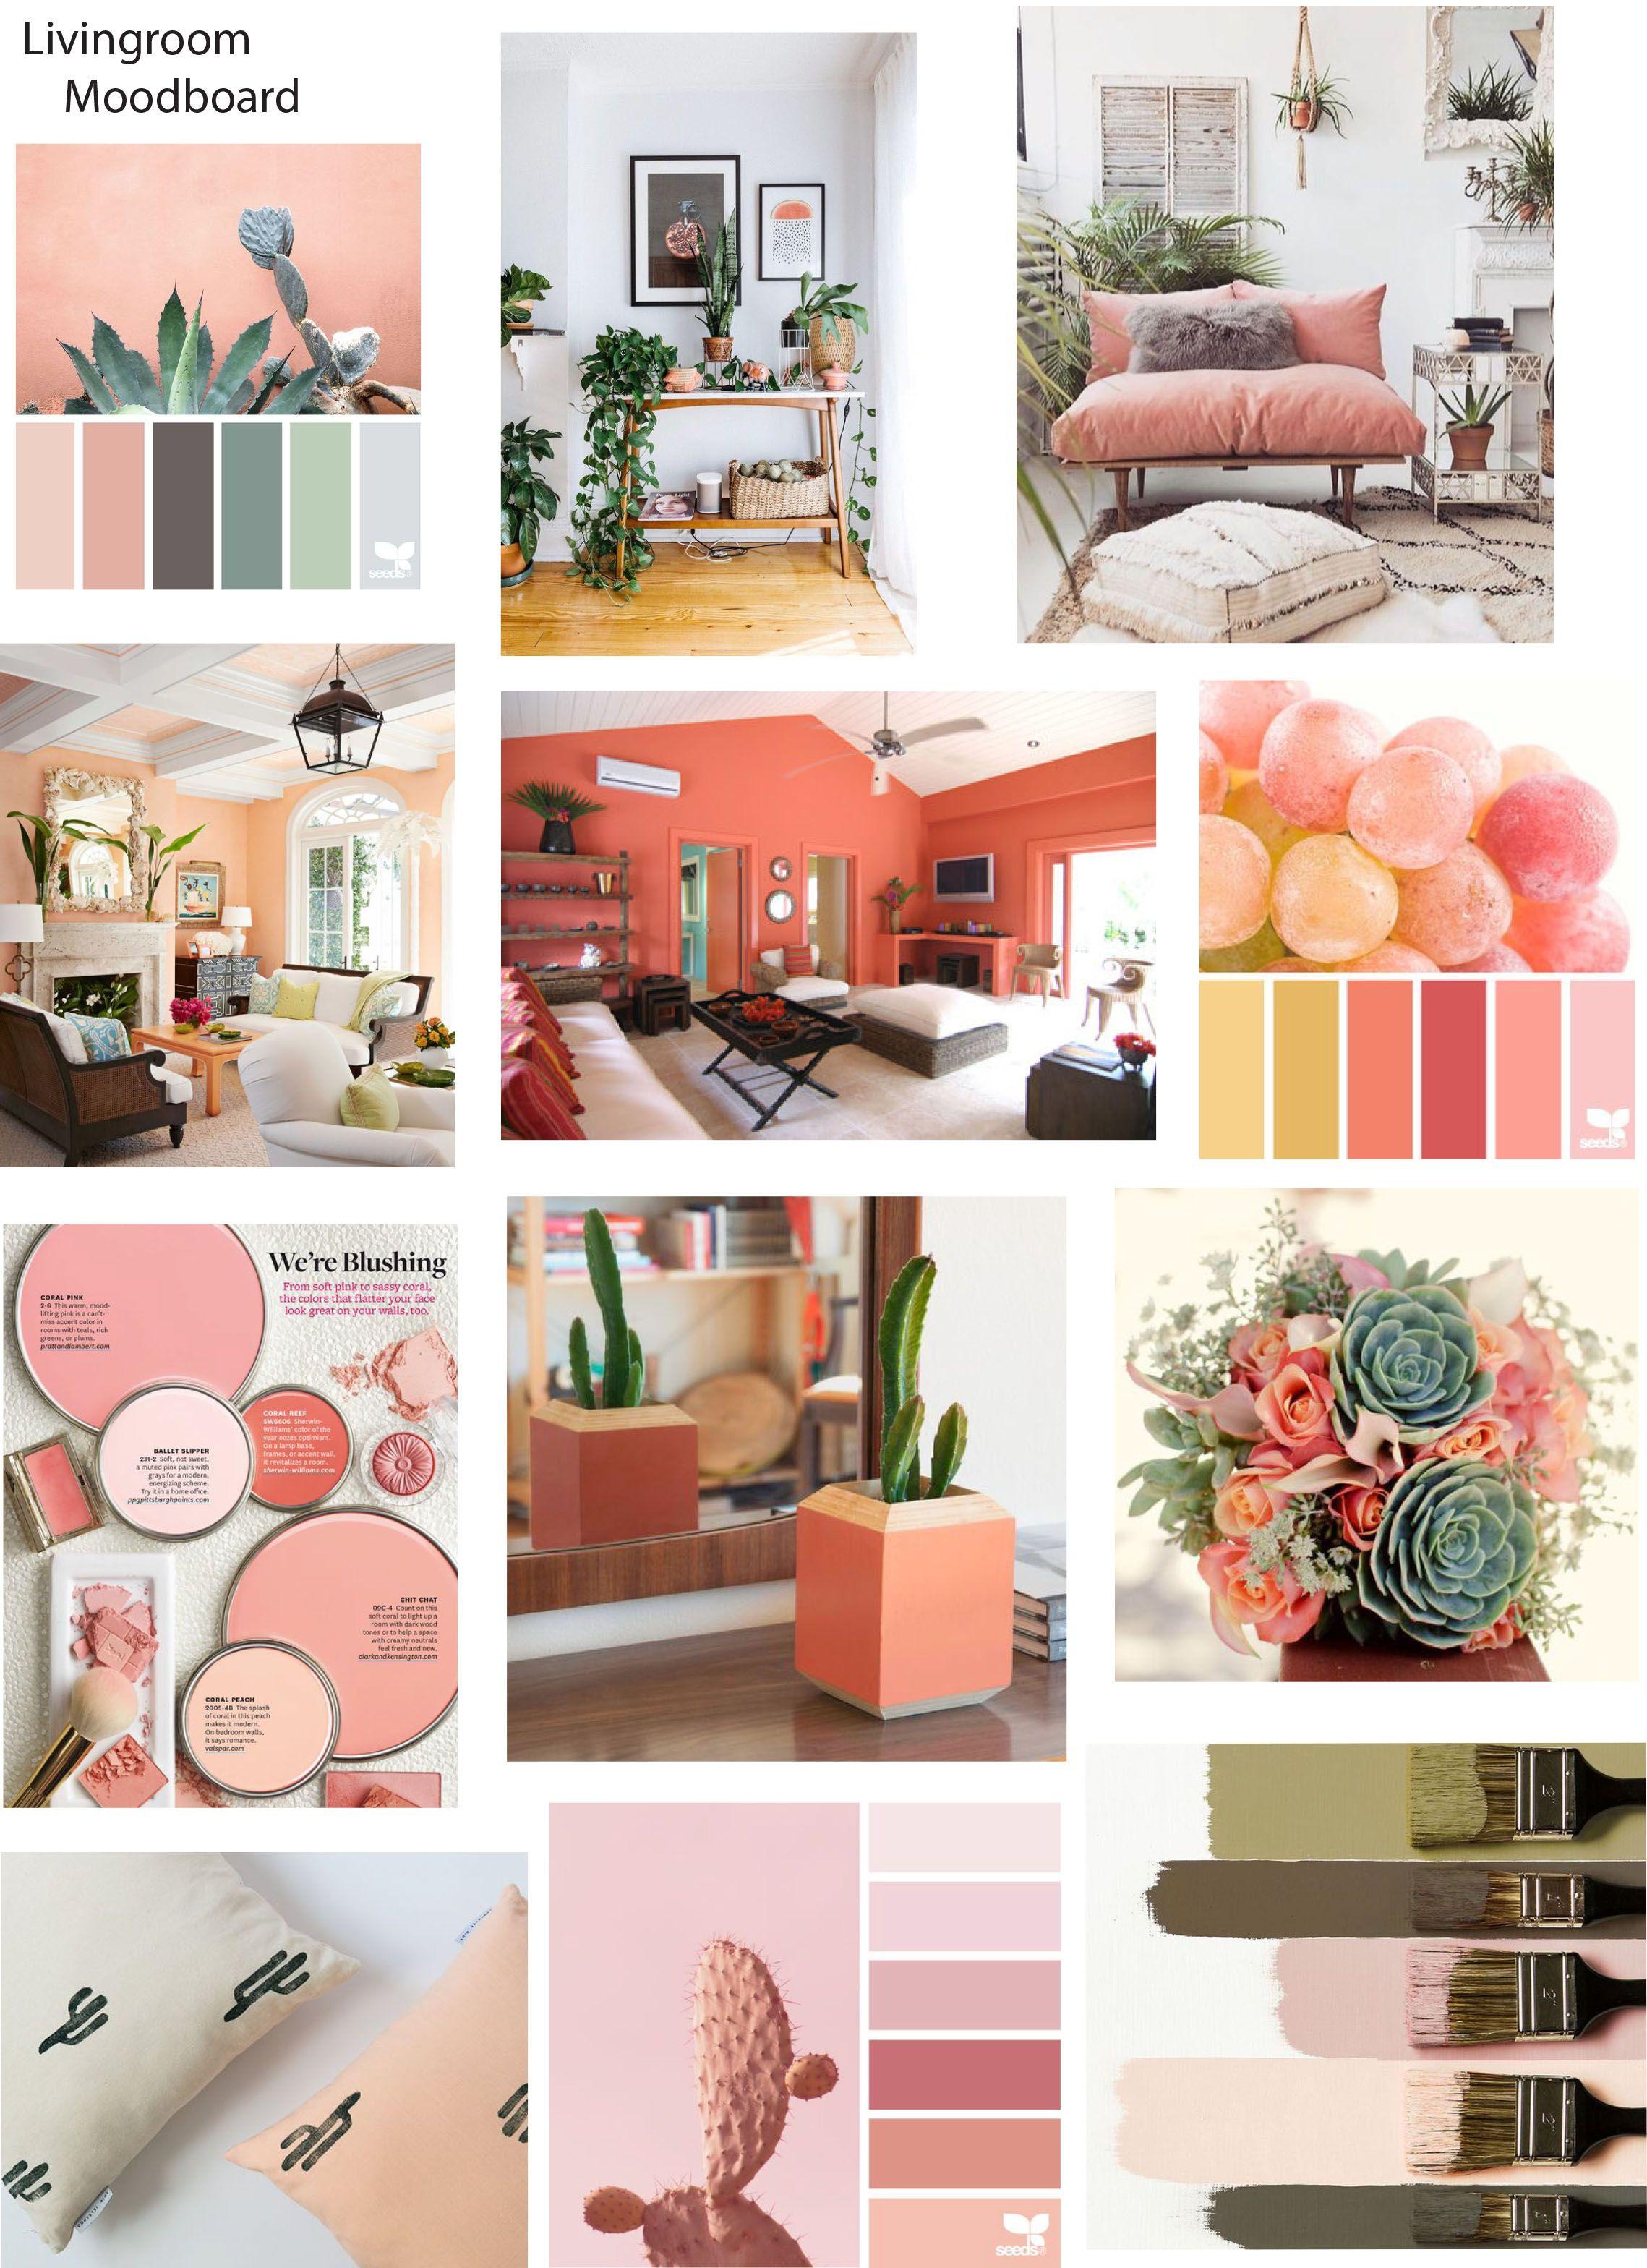 Peach Salmon Blushes Pinks Oranges